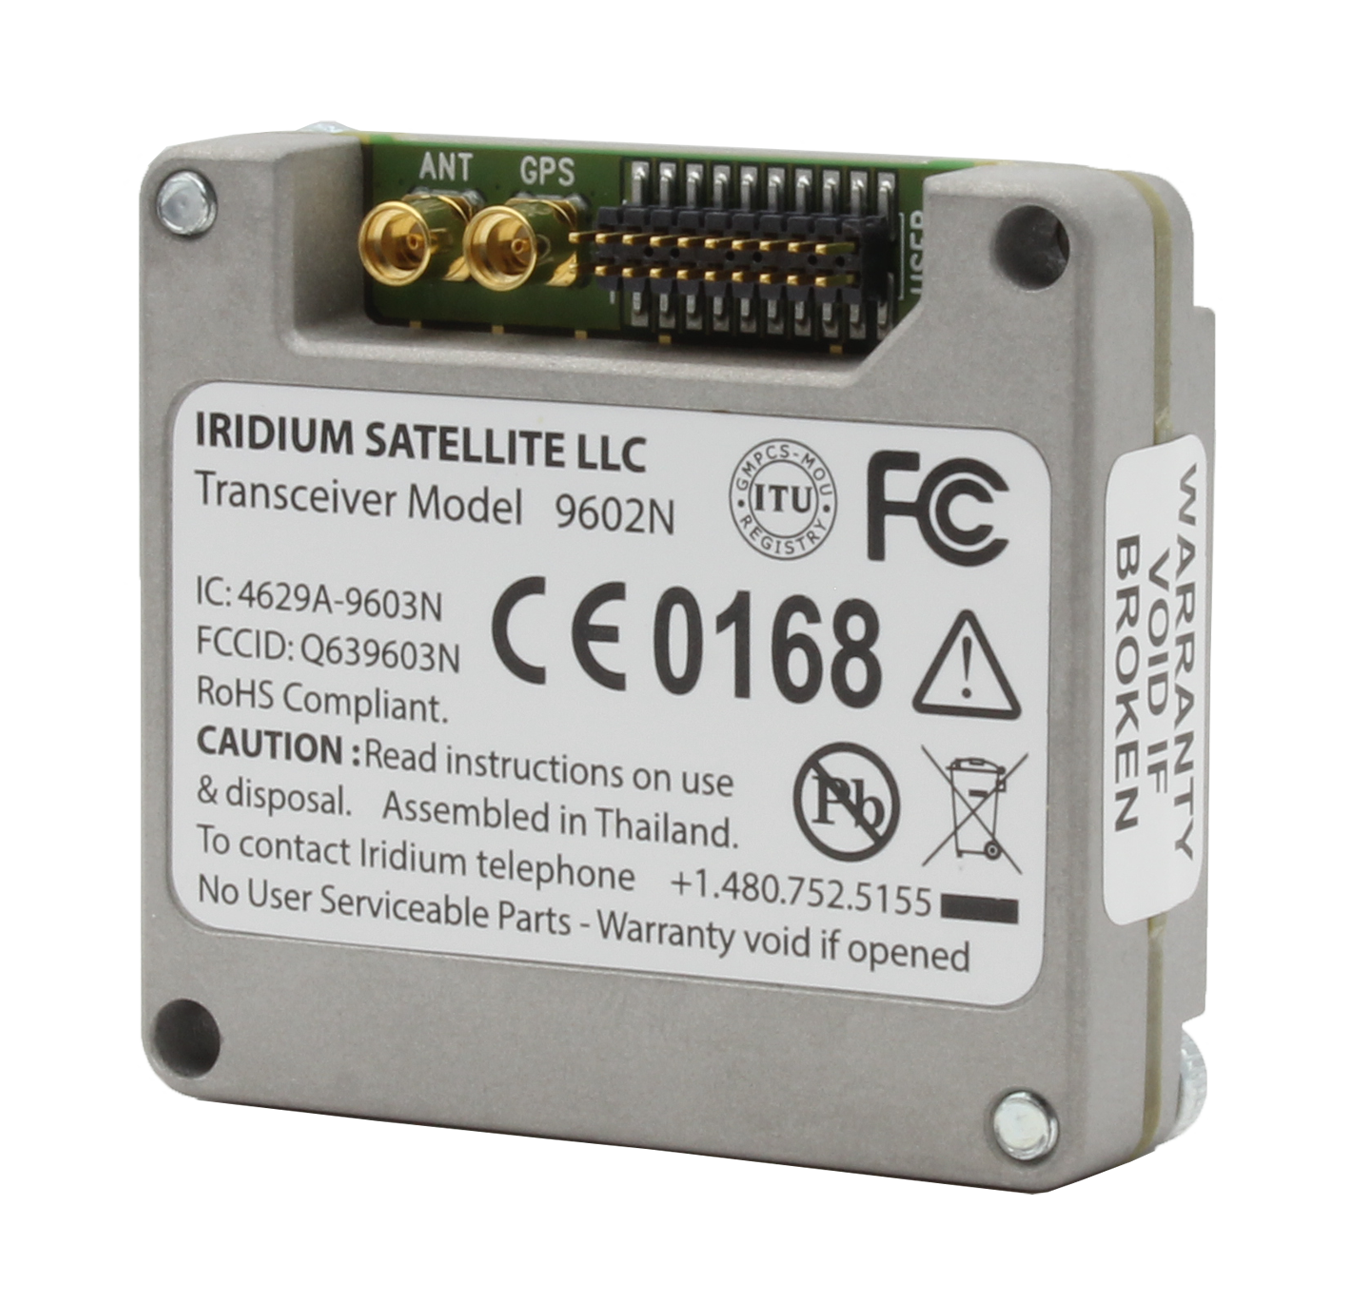 Iridium 9602 embedded transceiver